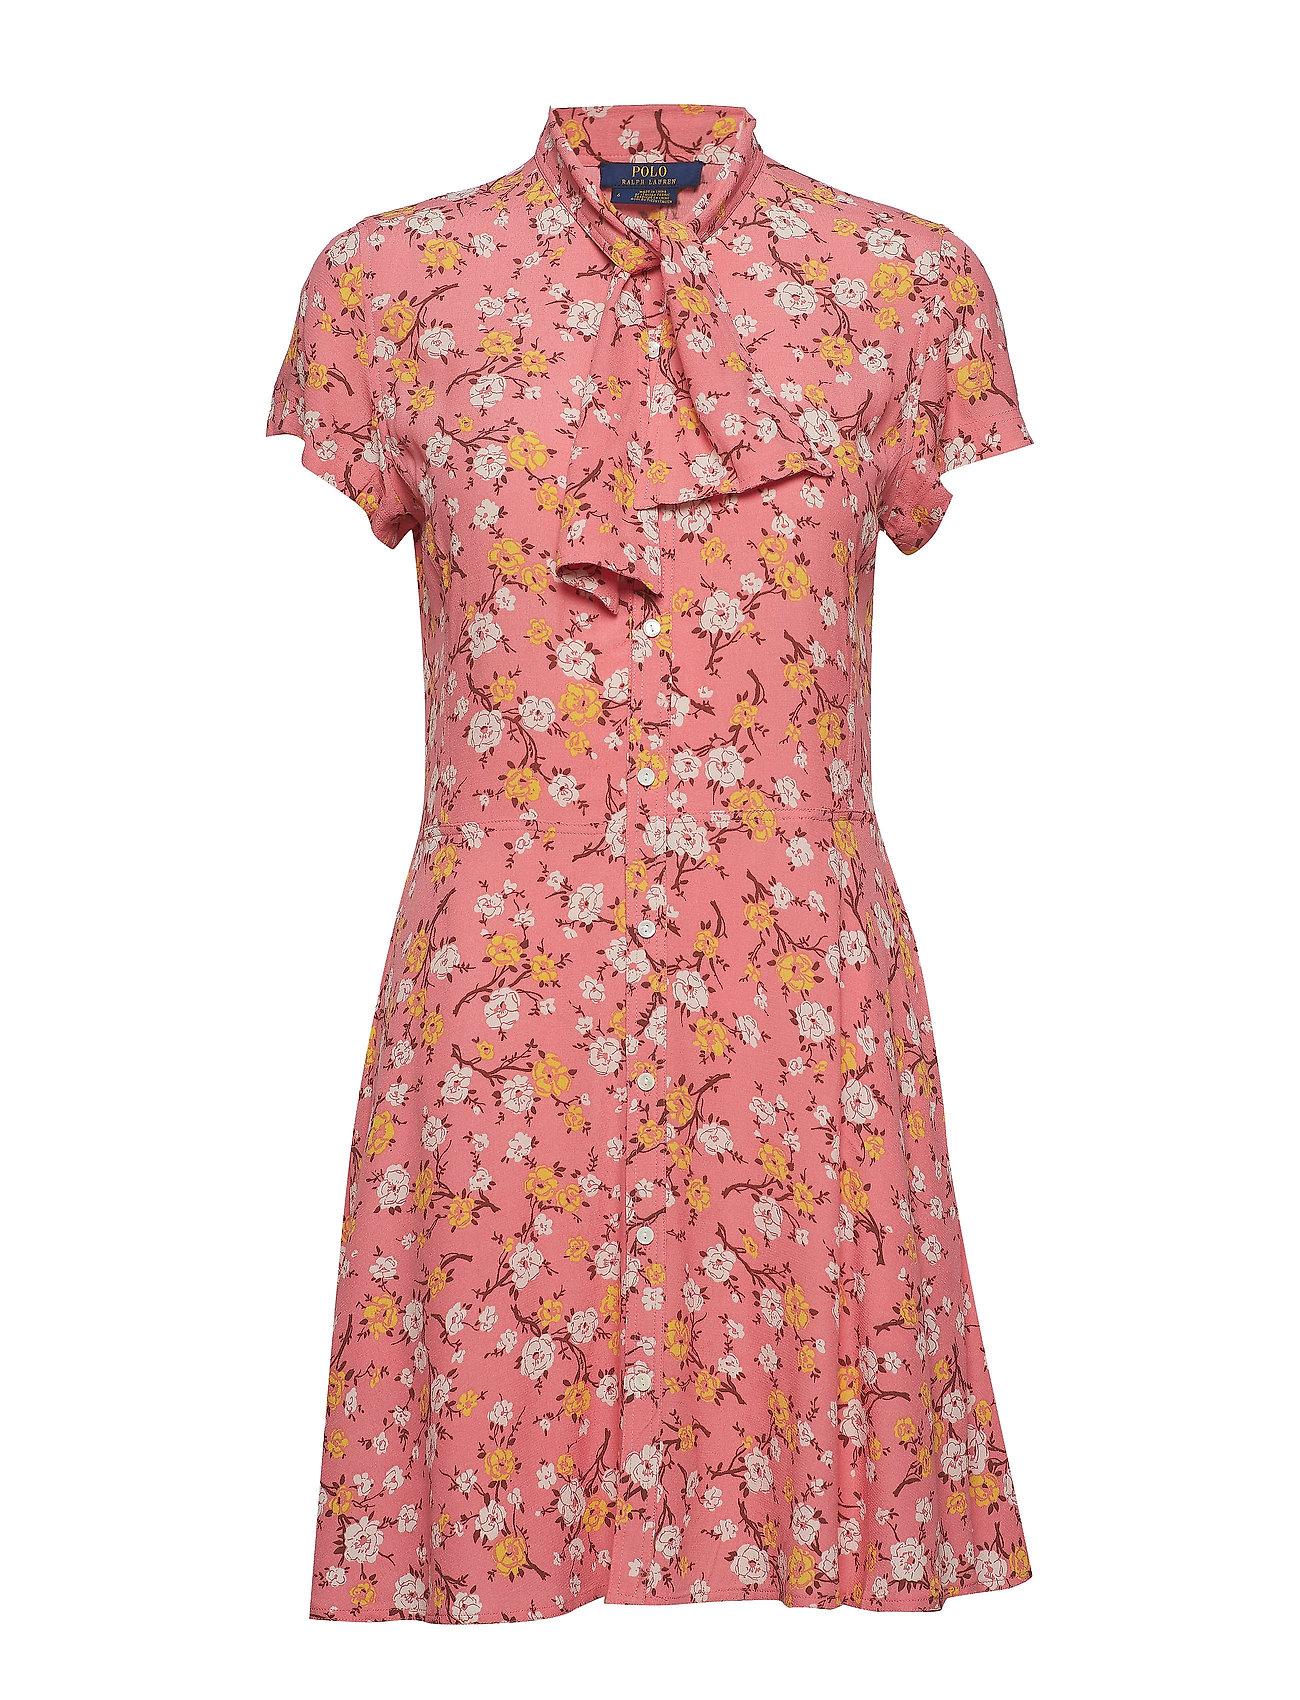 Polo Ralph Lauren Necktie Fit-and-Flare Dress - BLUSH FLORAL